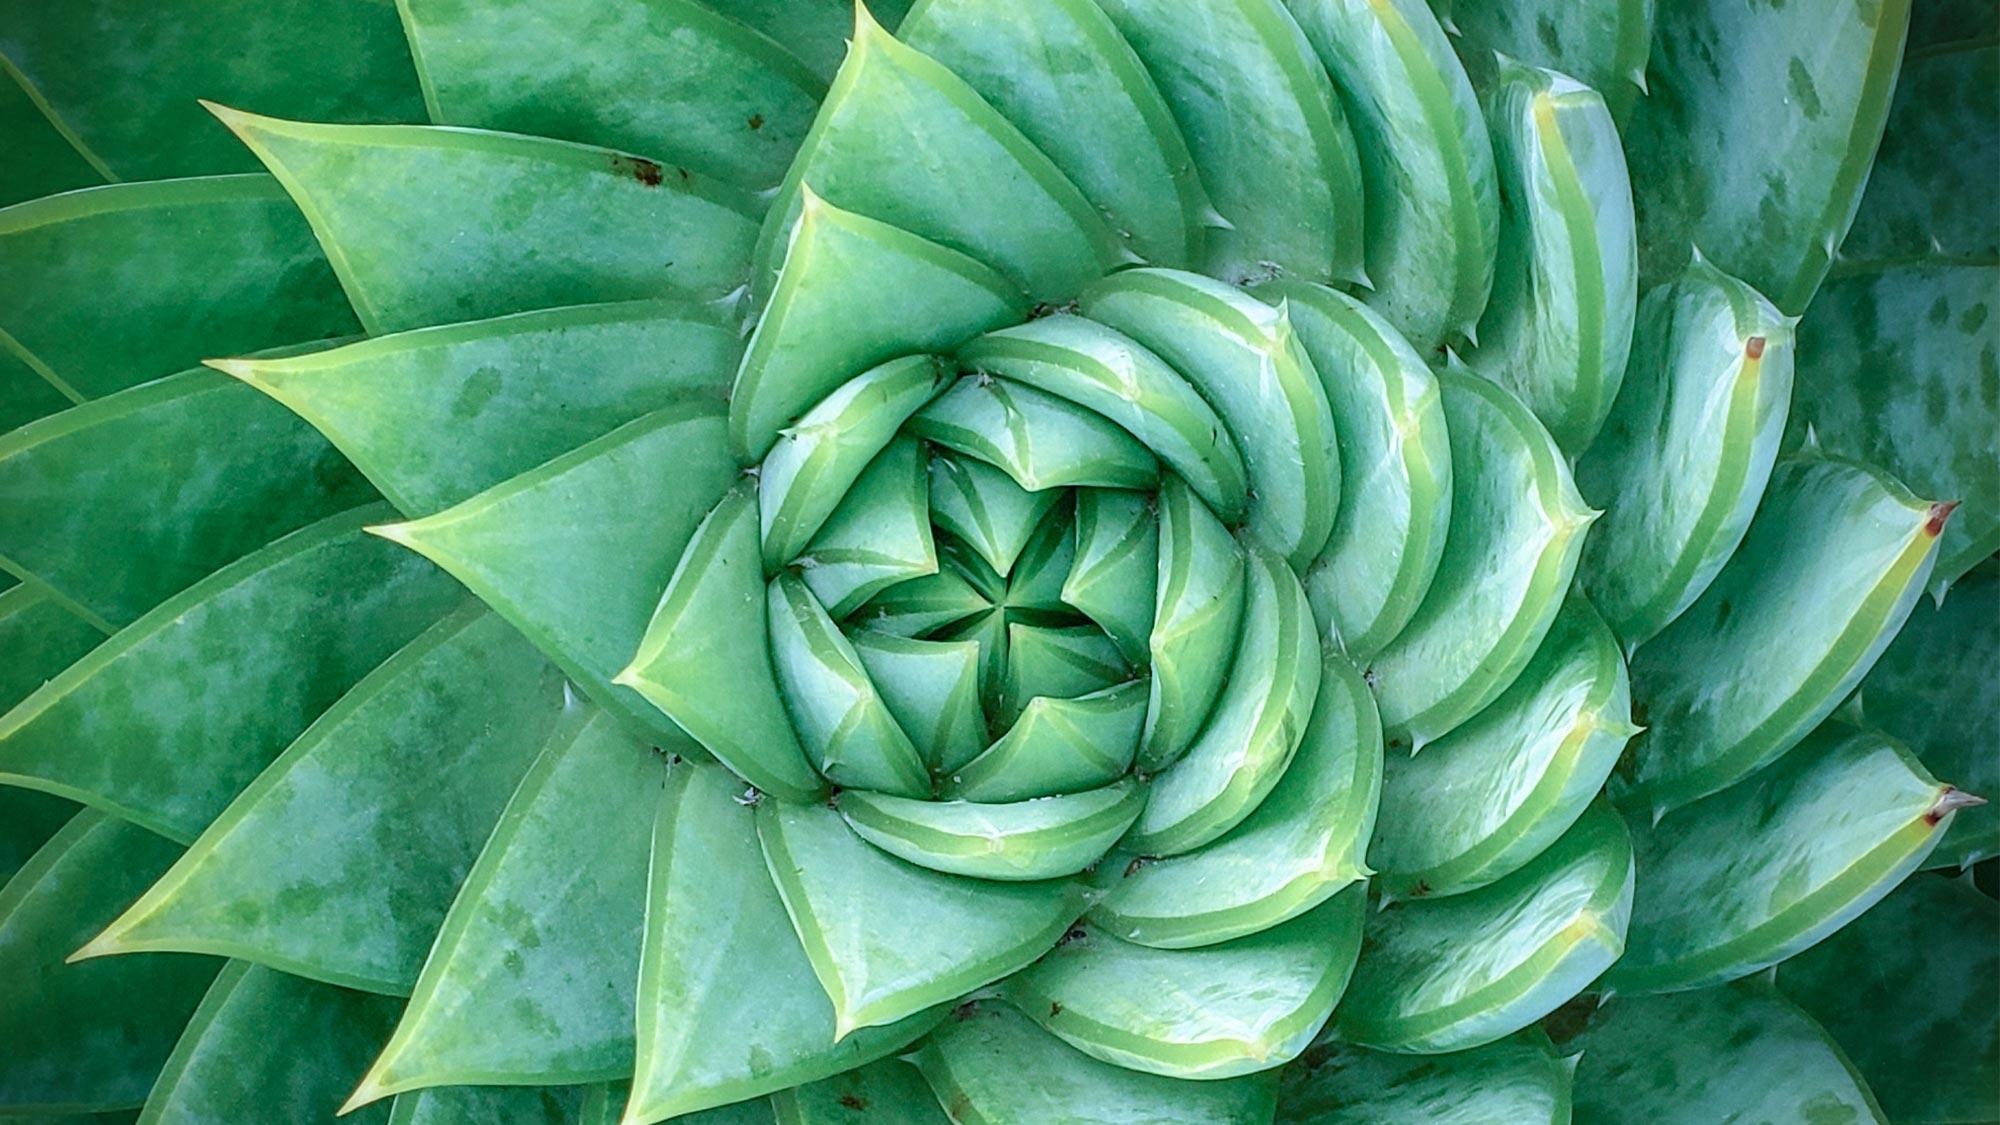 Plant 1146556855 UK CW